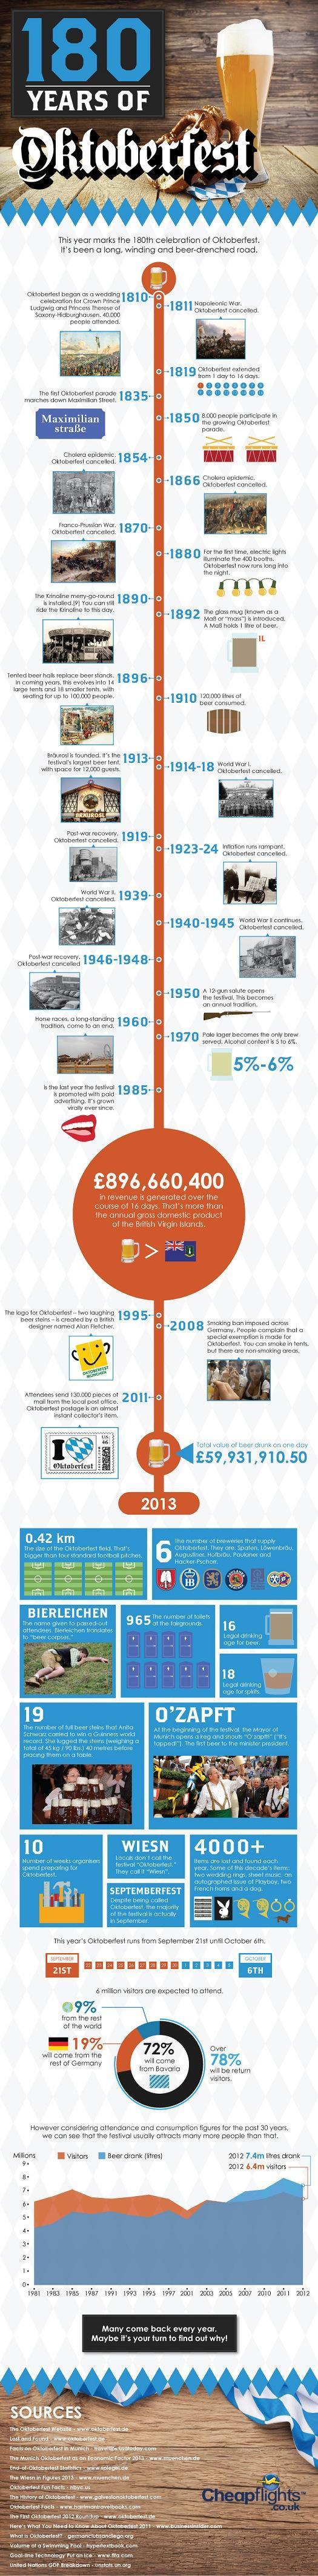 Oktoberfest-infographic